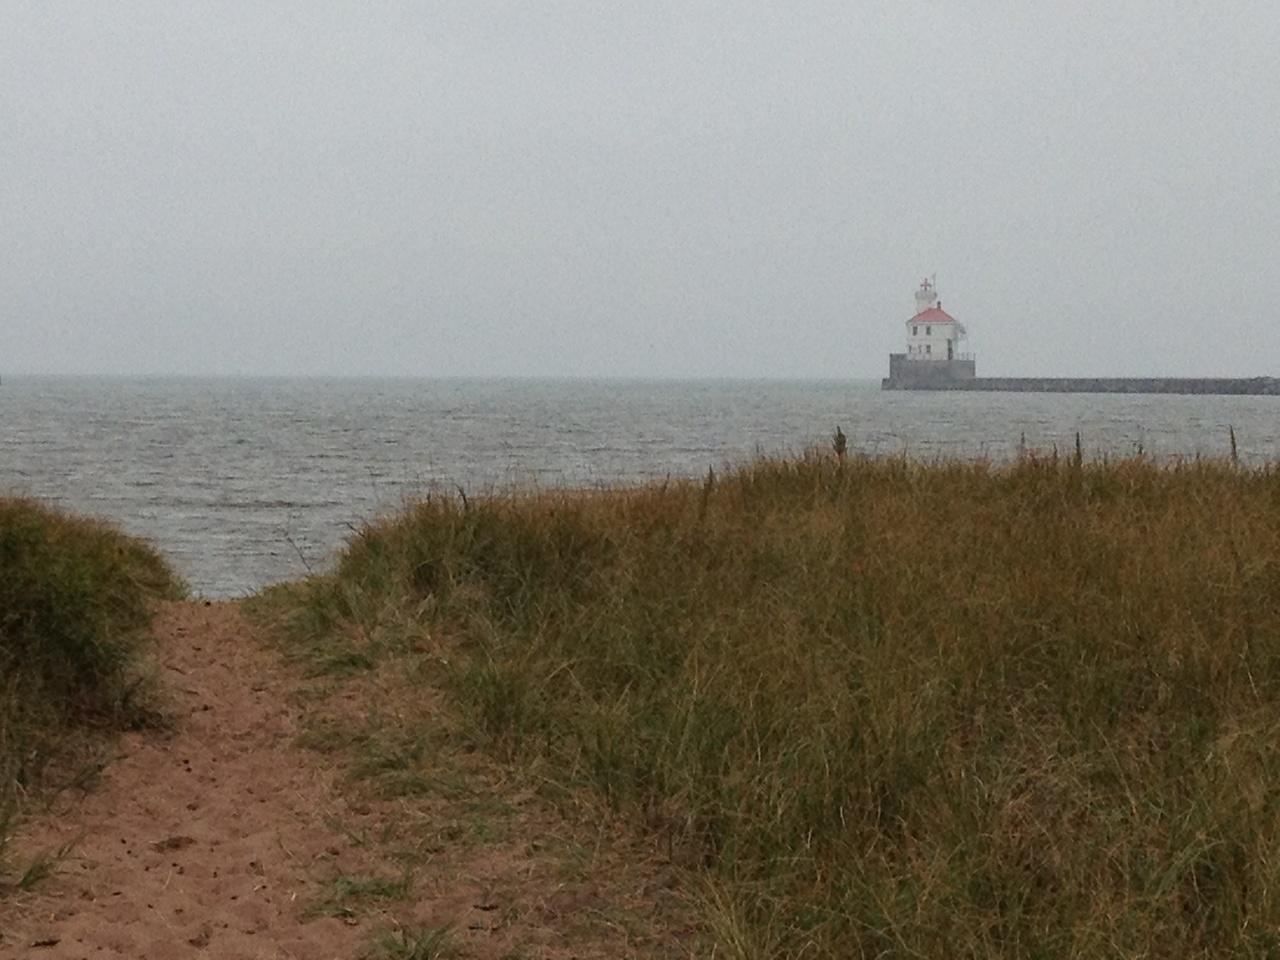 Beach access on Wisconsin Point Peninsula